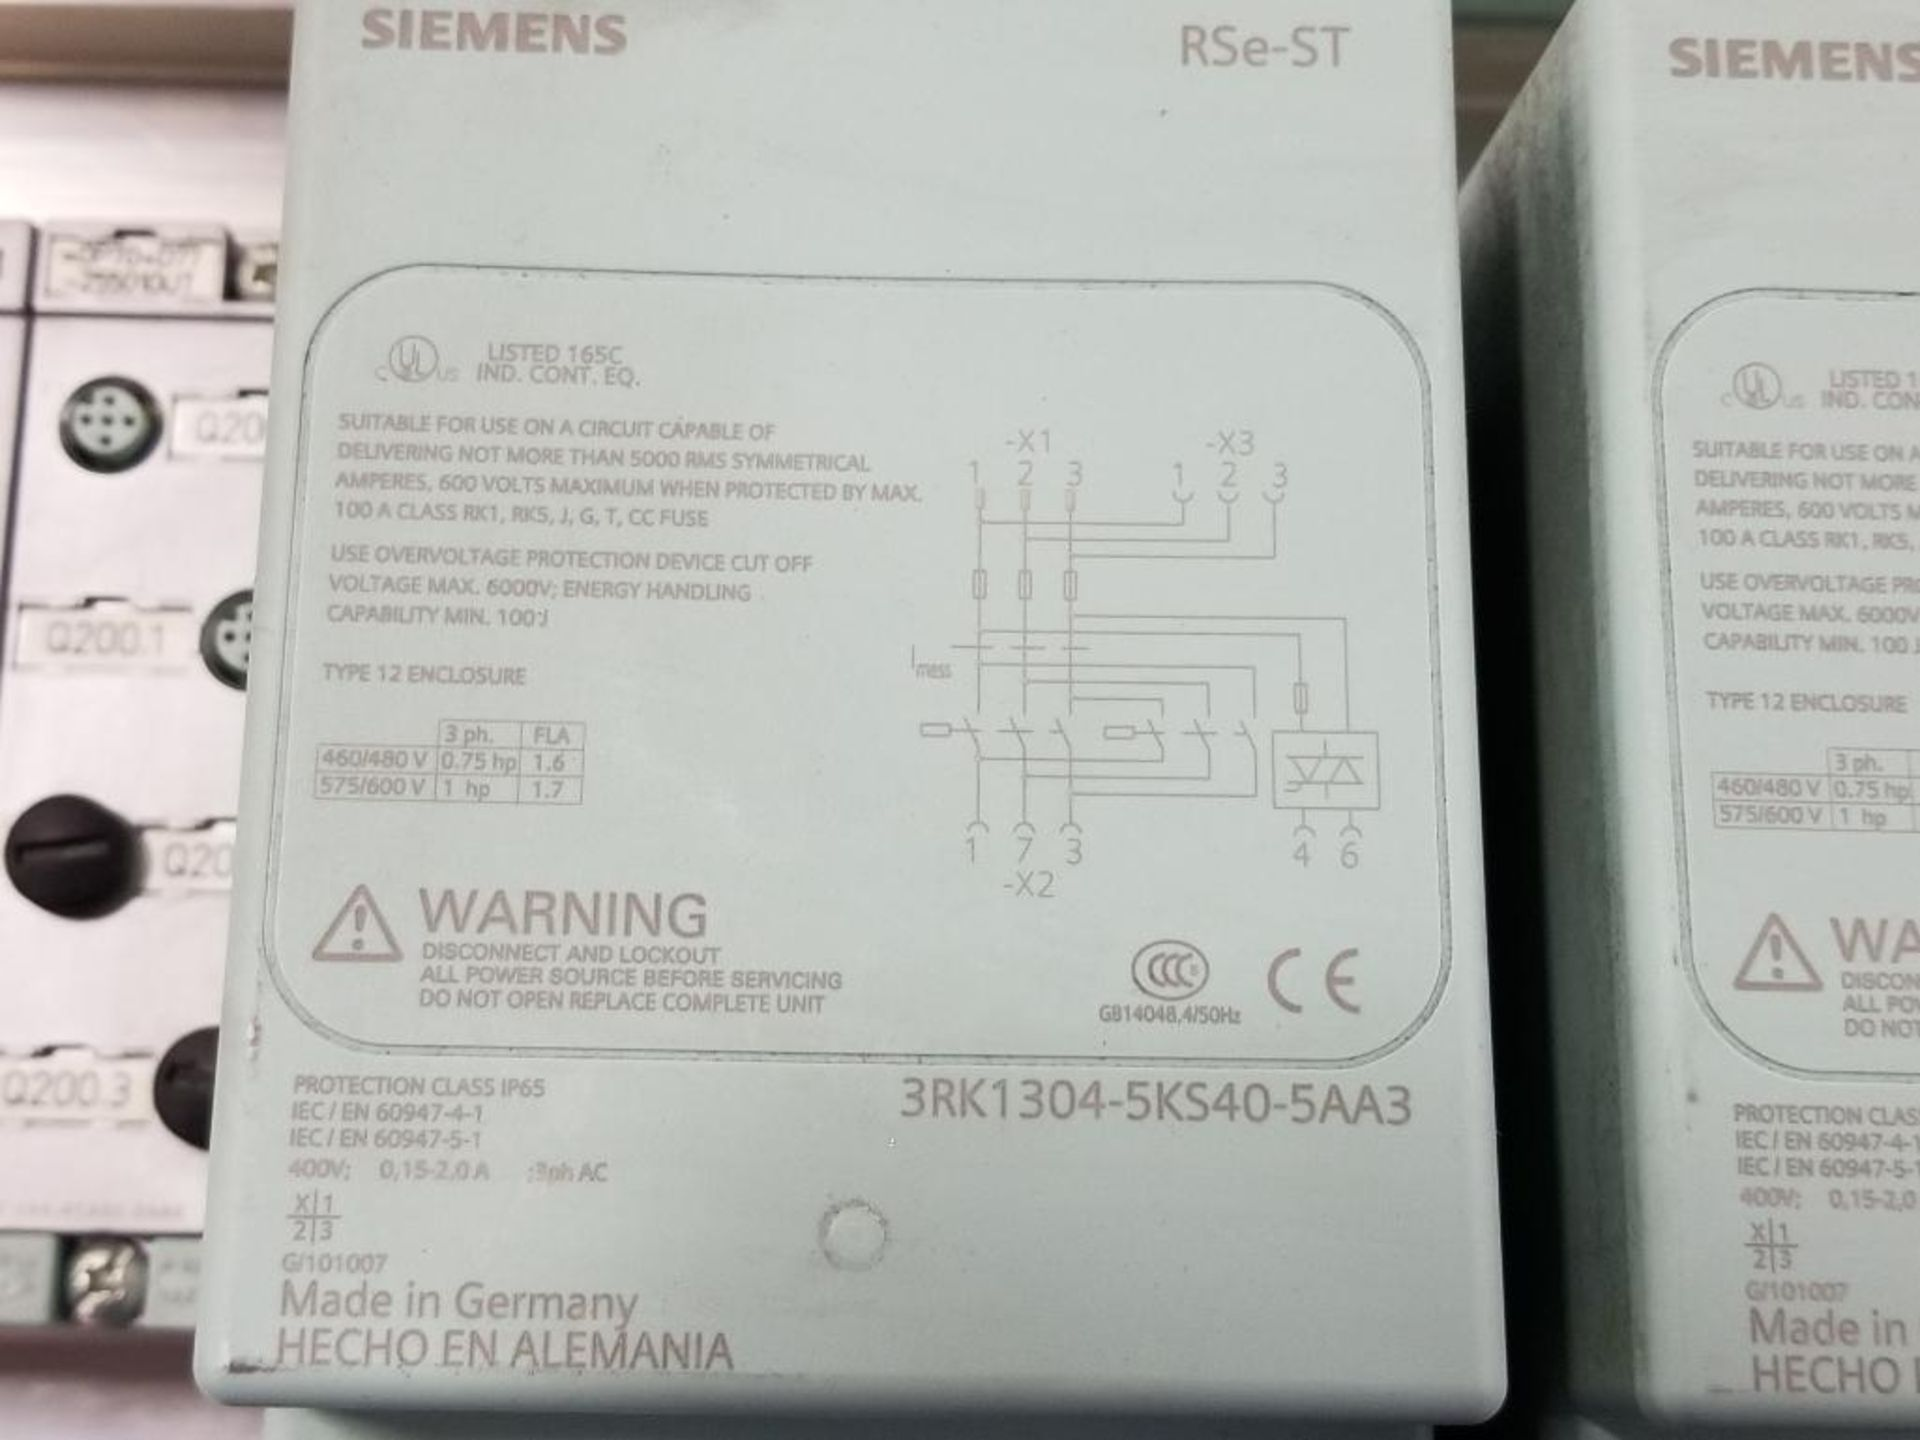 Qty 2 - Siemens RSe-ST 3RK1304-5KS40-5AA3 Reversing starter. - Image 4 of 7